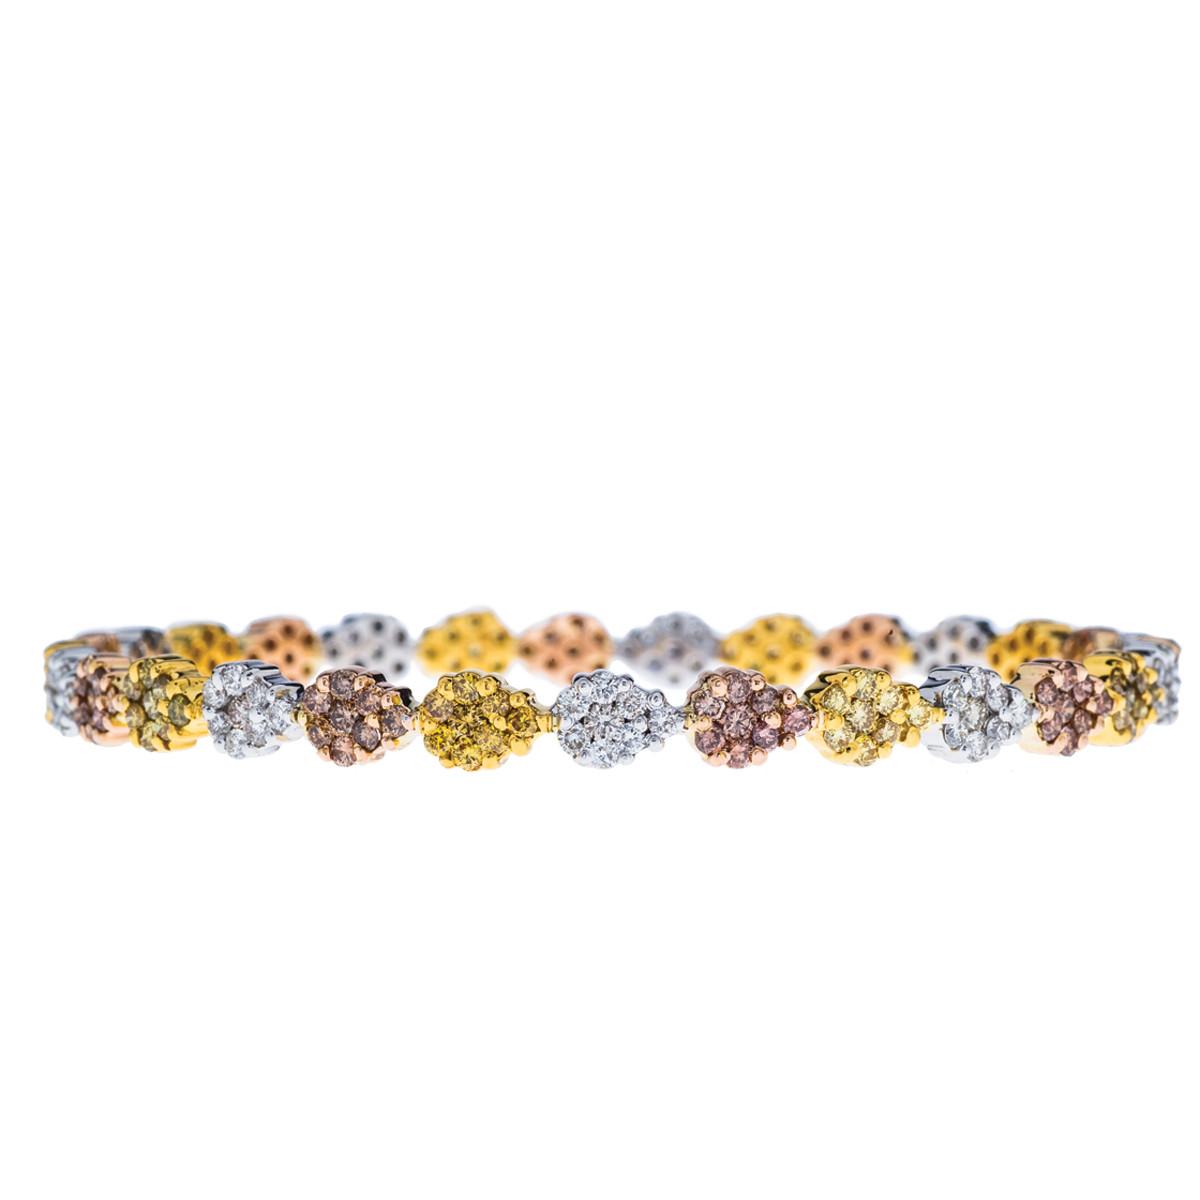 Vintage 5.80 CTW Pink, Yellow & White Diamond Bangle